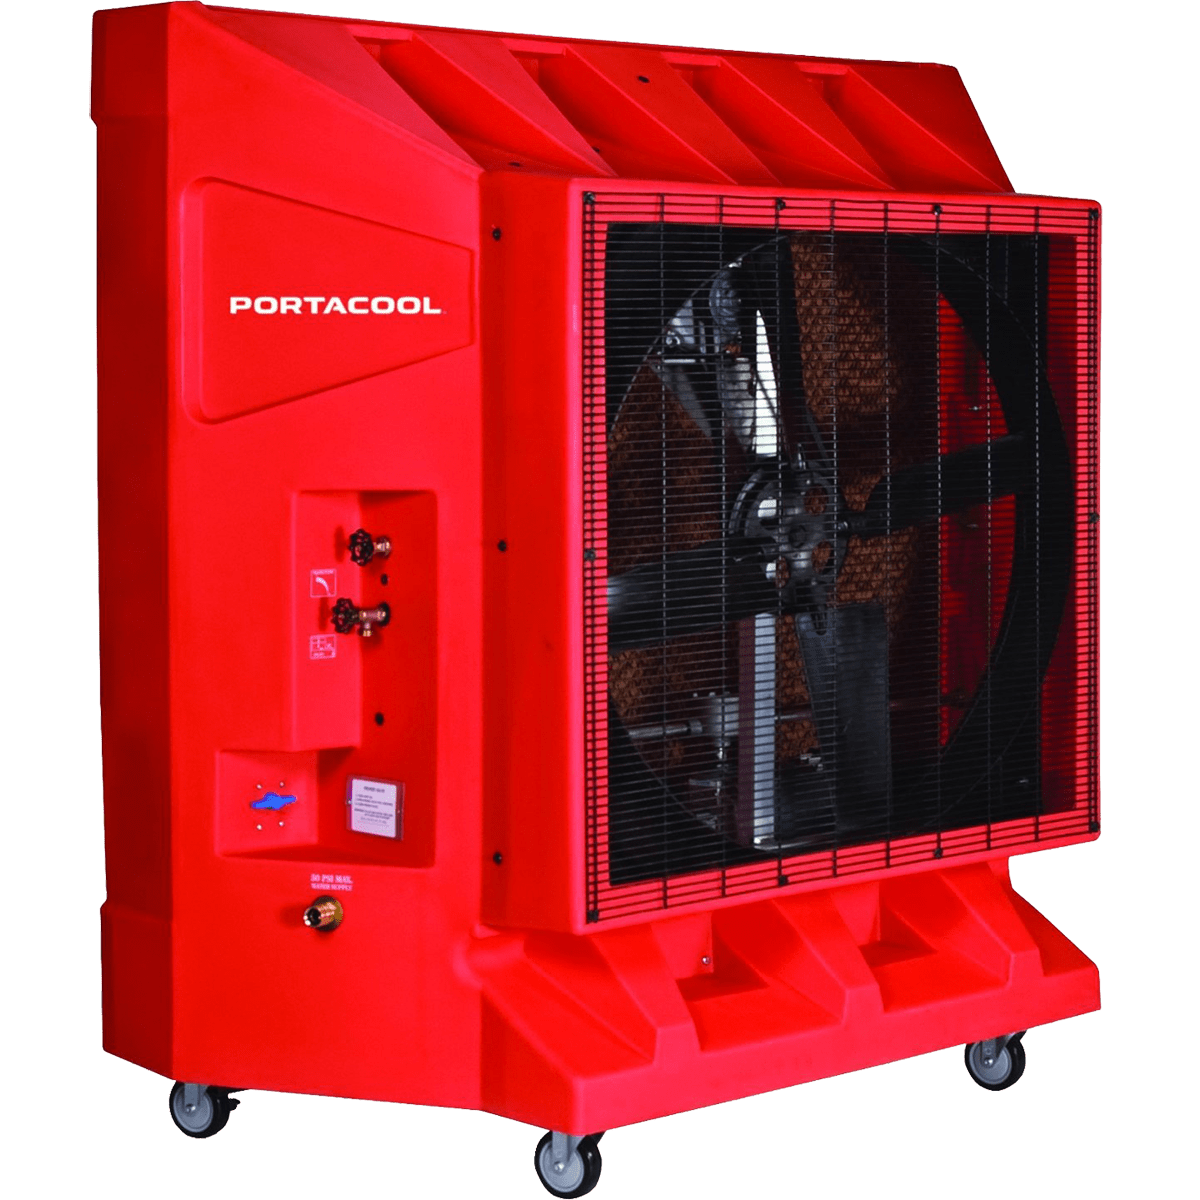 Portacool 36-Inch Hazardous Location Evaporative Cooler (PAC2K36HZ) po2145